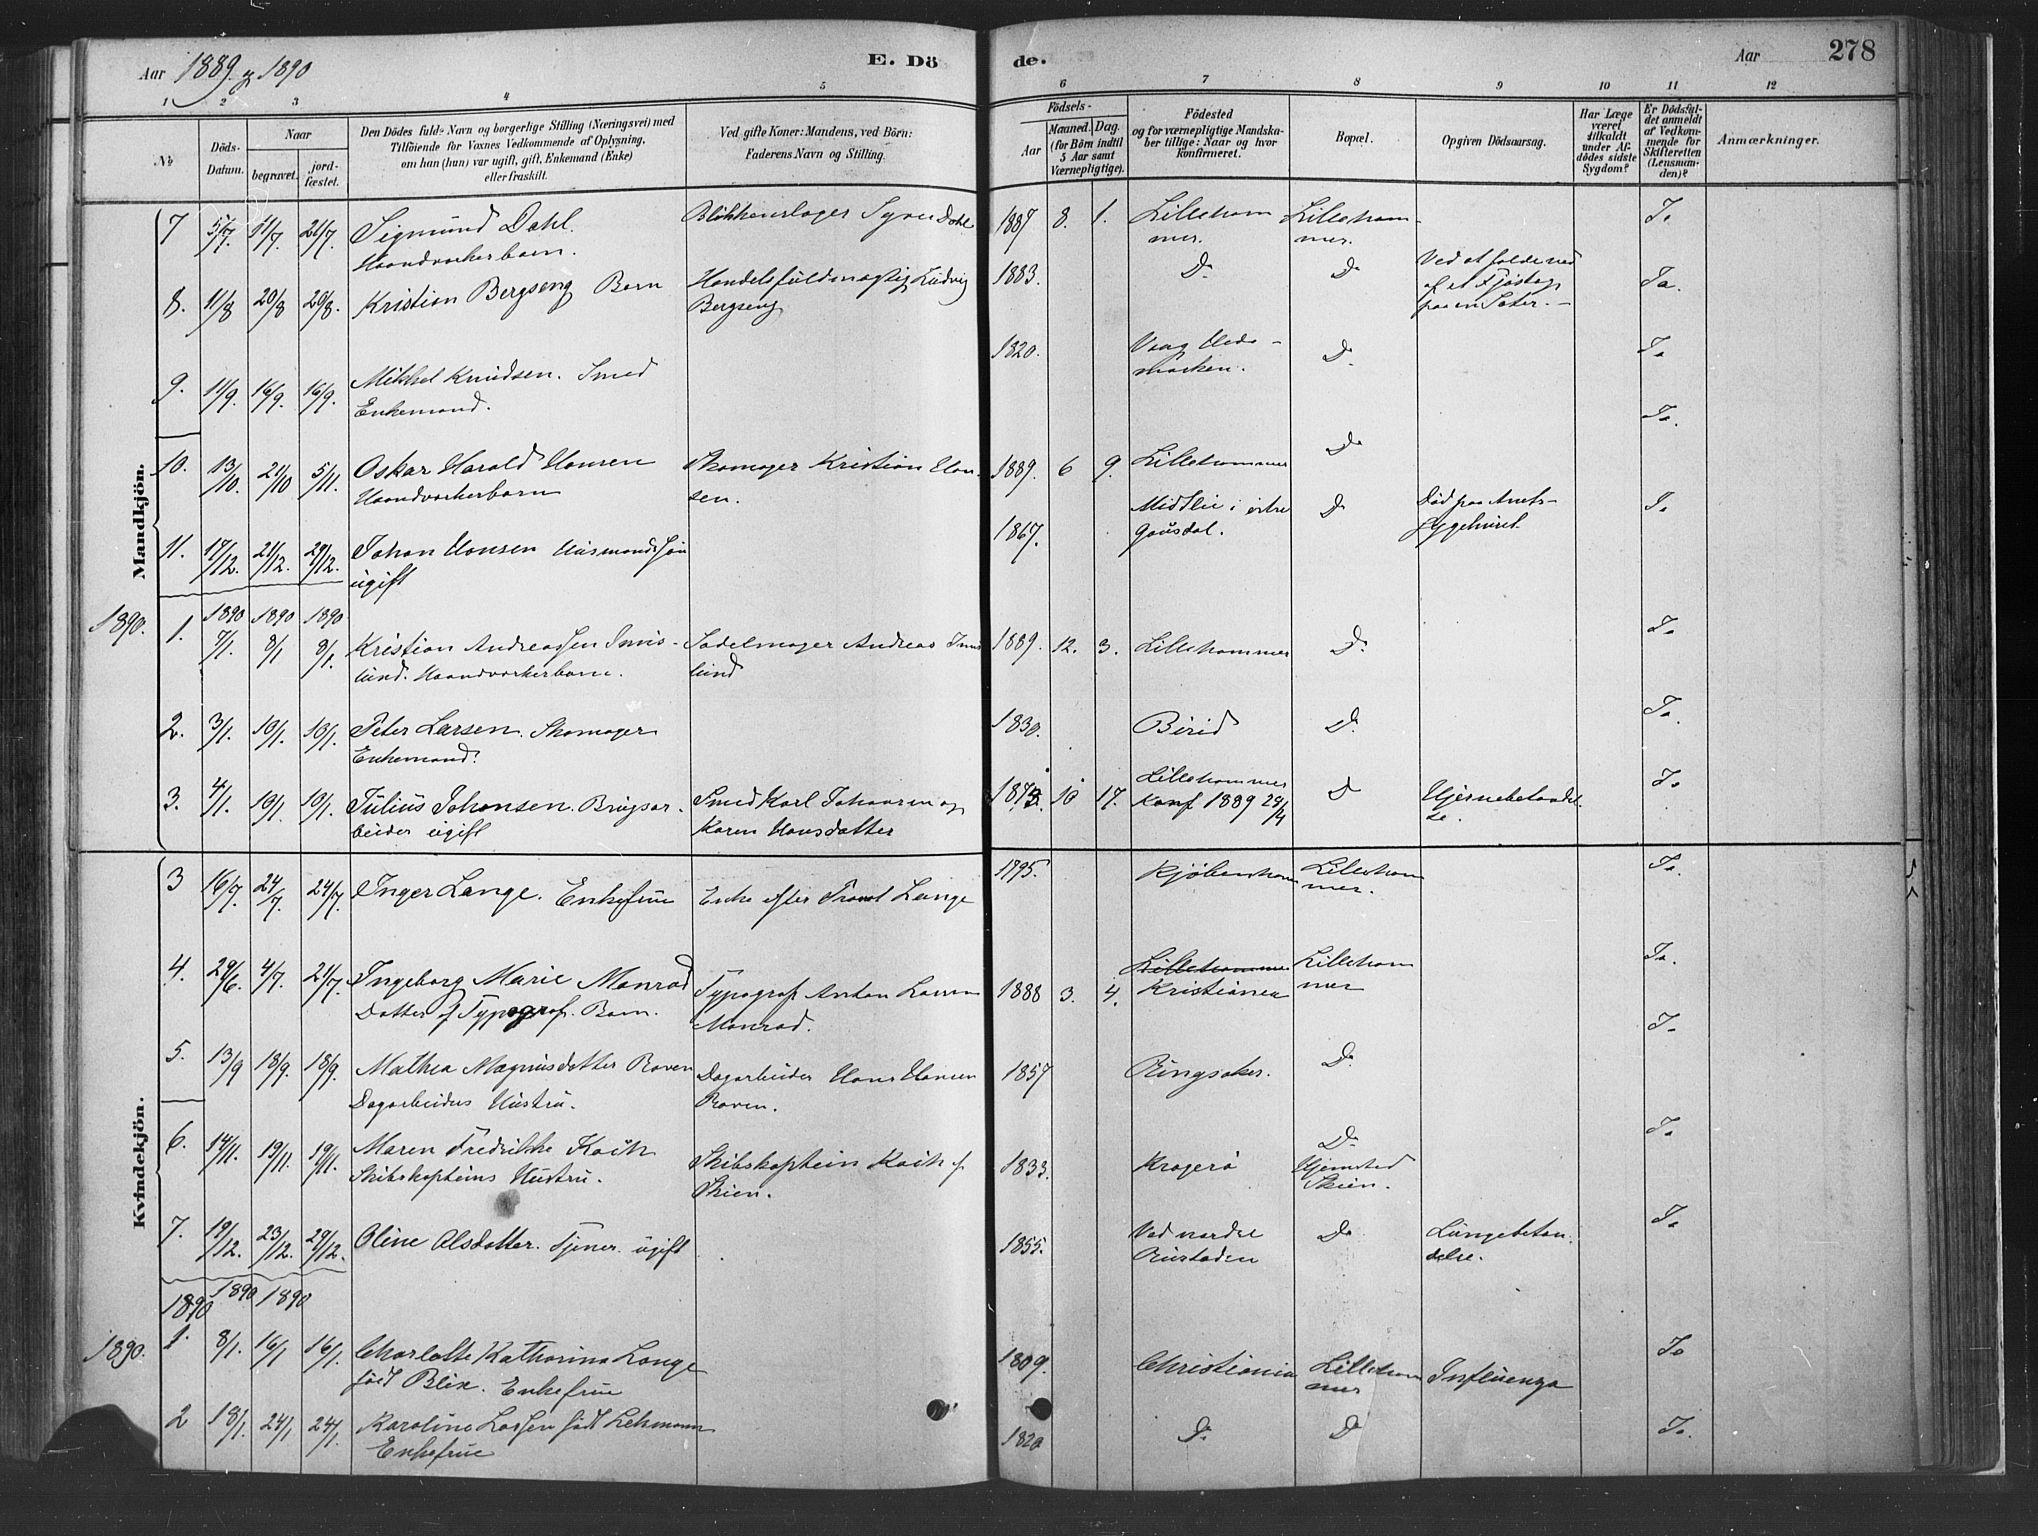 SAH, Fåberg prestekontor, Ministerialbok nr. 10, 1879-1900, s. 278